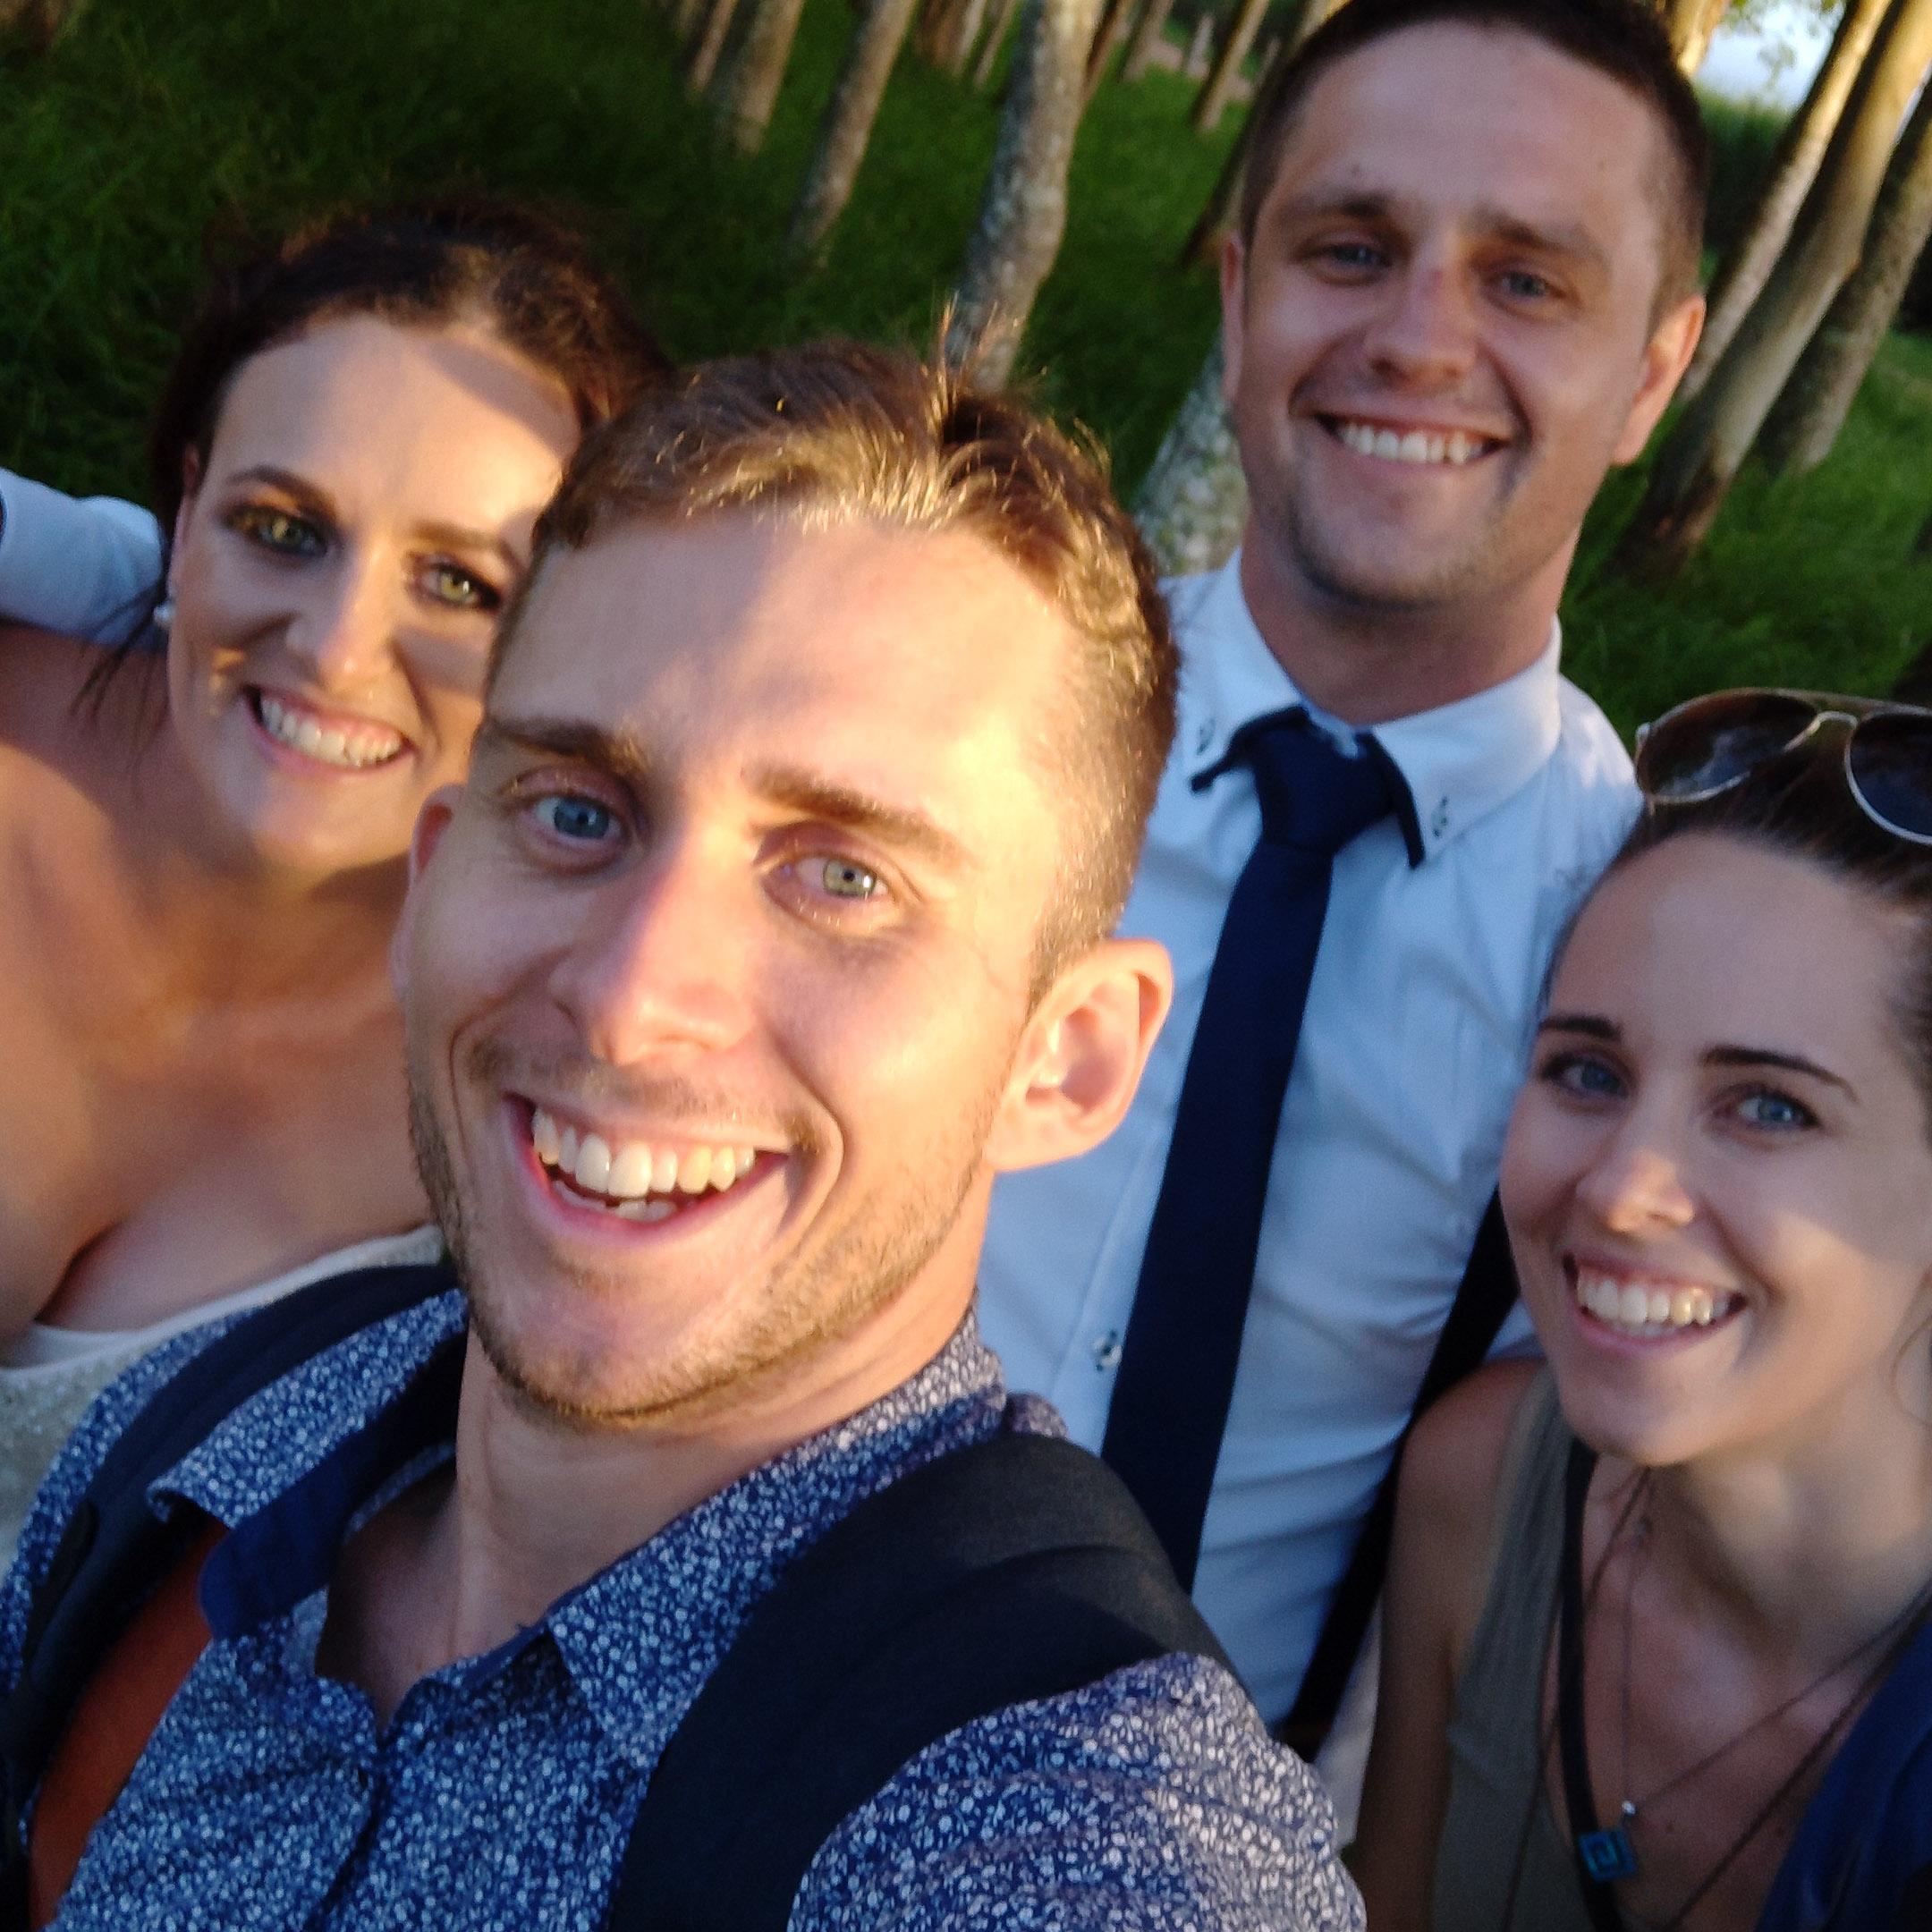 The-raw-photographer-cairns-wedding-photography-bridalparty-selfie-2.jpg